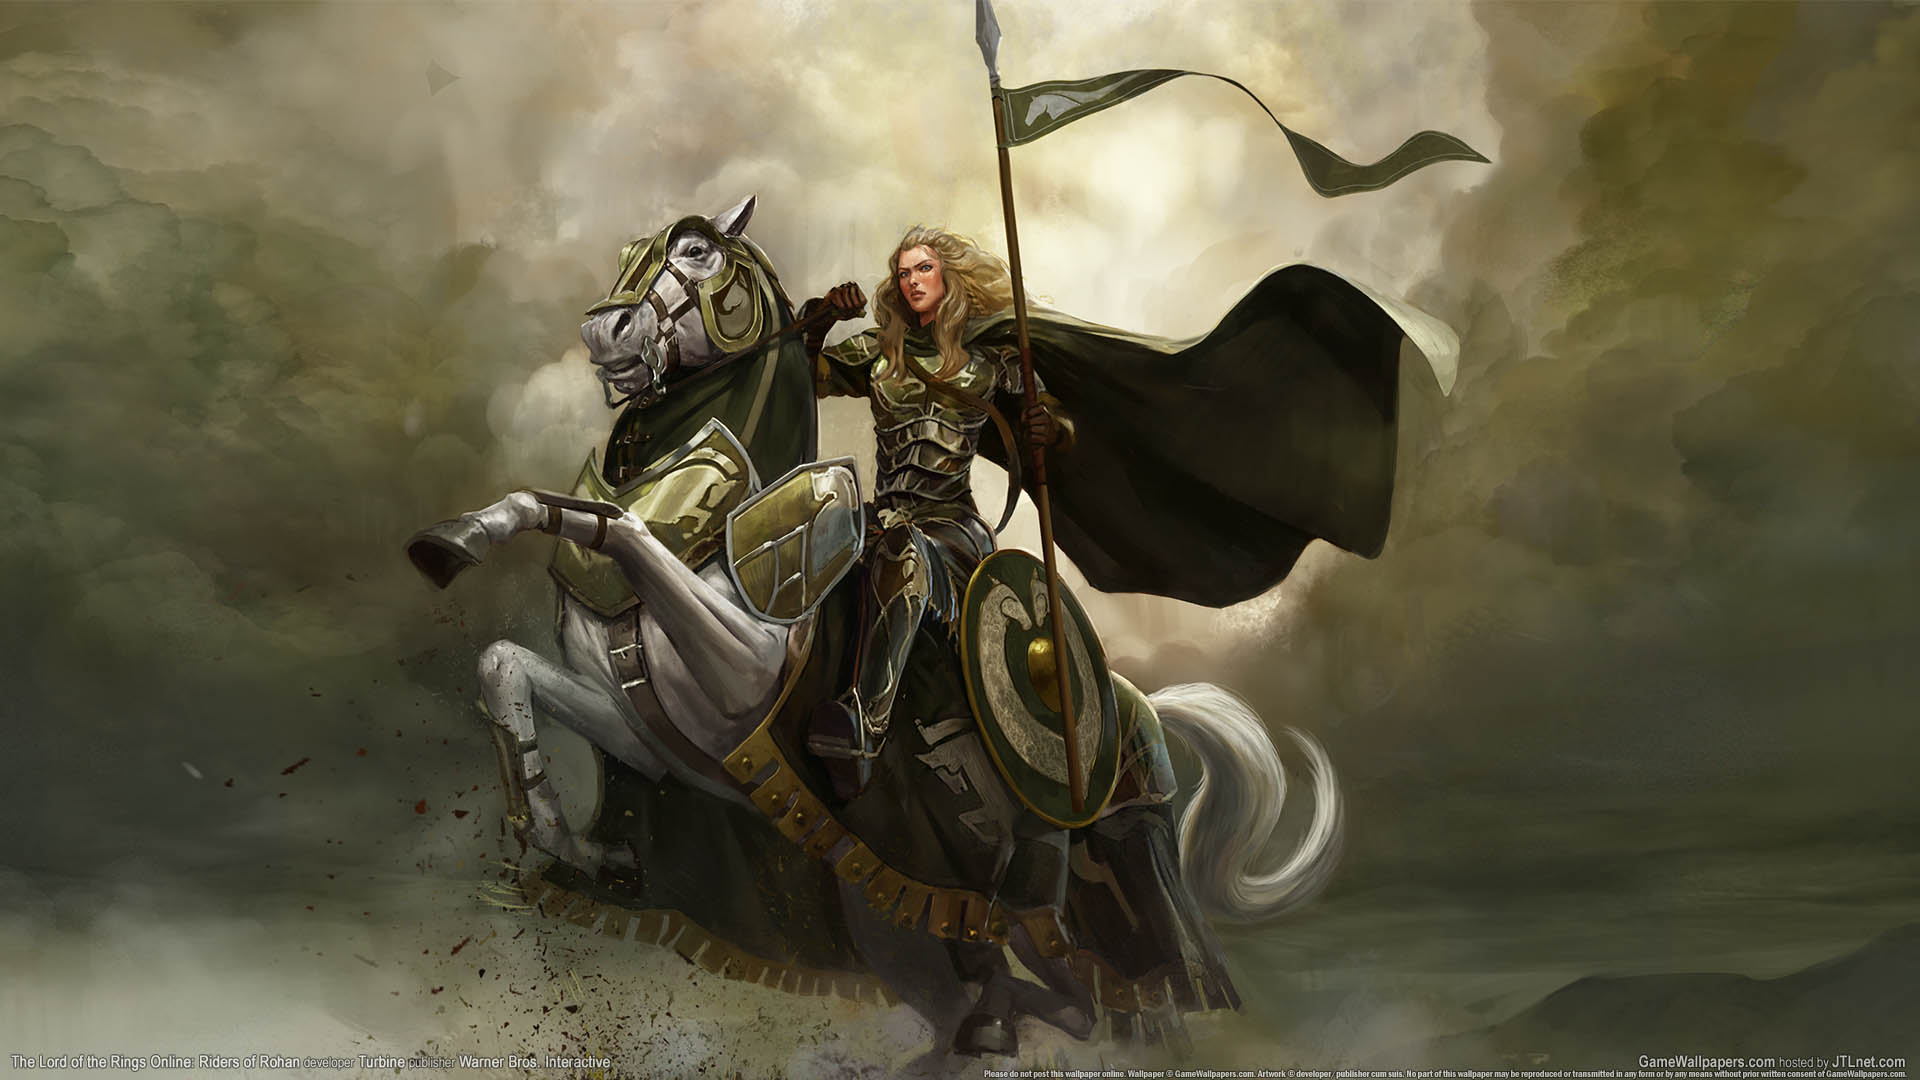 The Lord of the Rings Online: Riders of Rohan fondo de escritorio 02 1920x1080